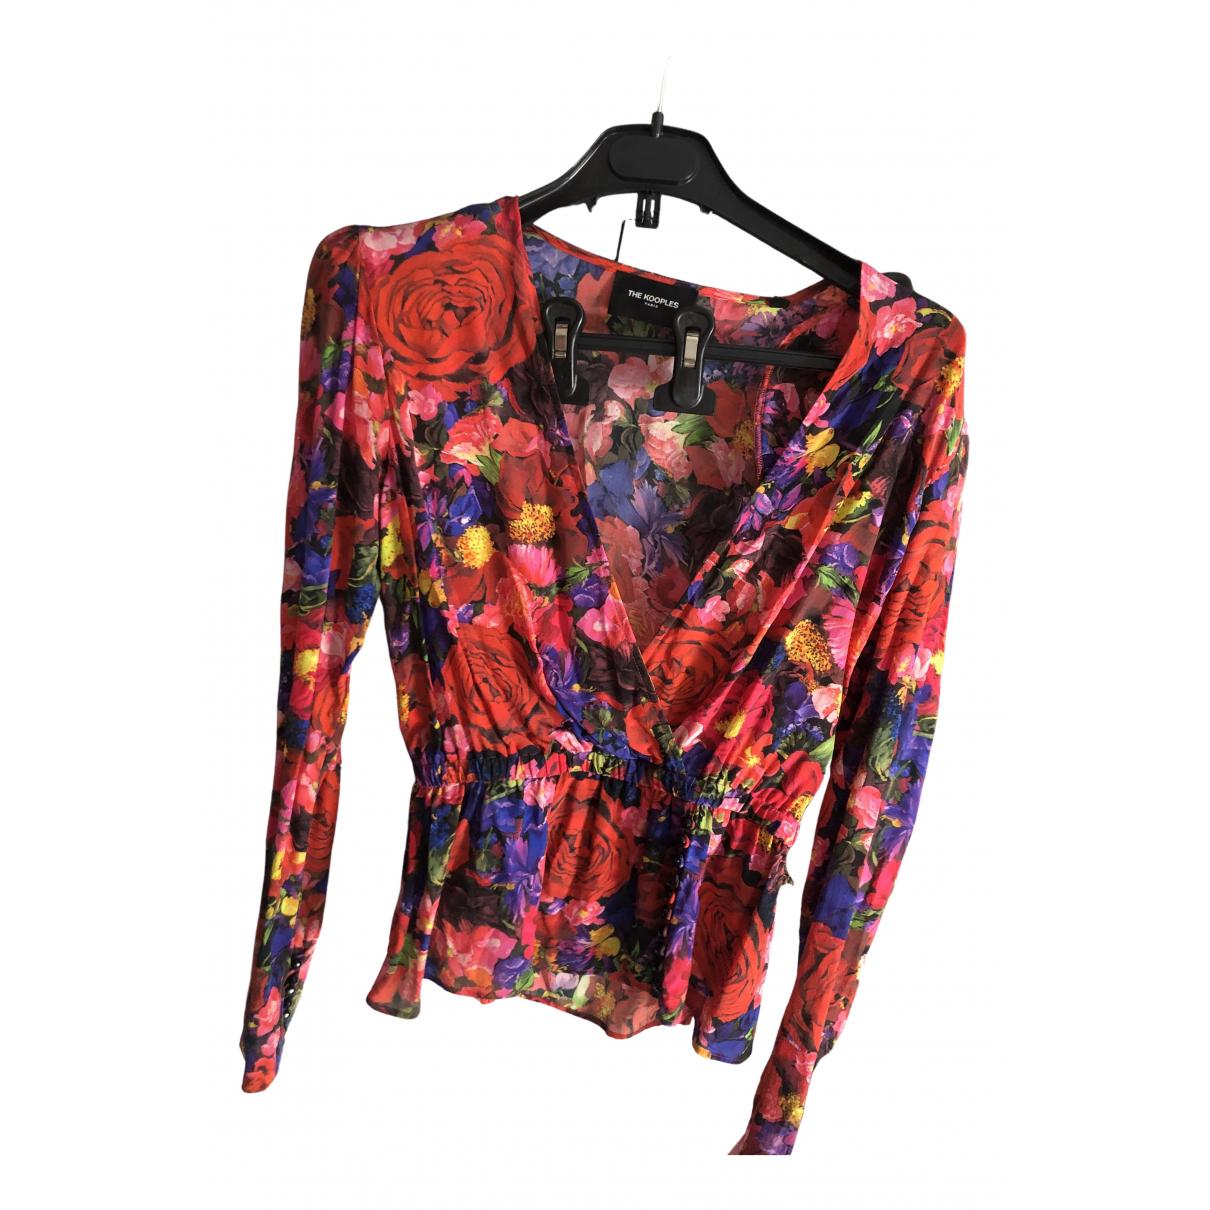 The Kooples Fall Winter 2019 Multicolour Silk  top for Women 1 0-5